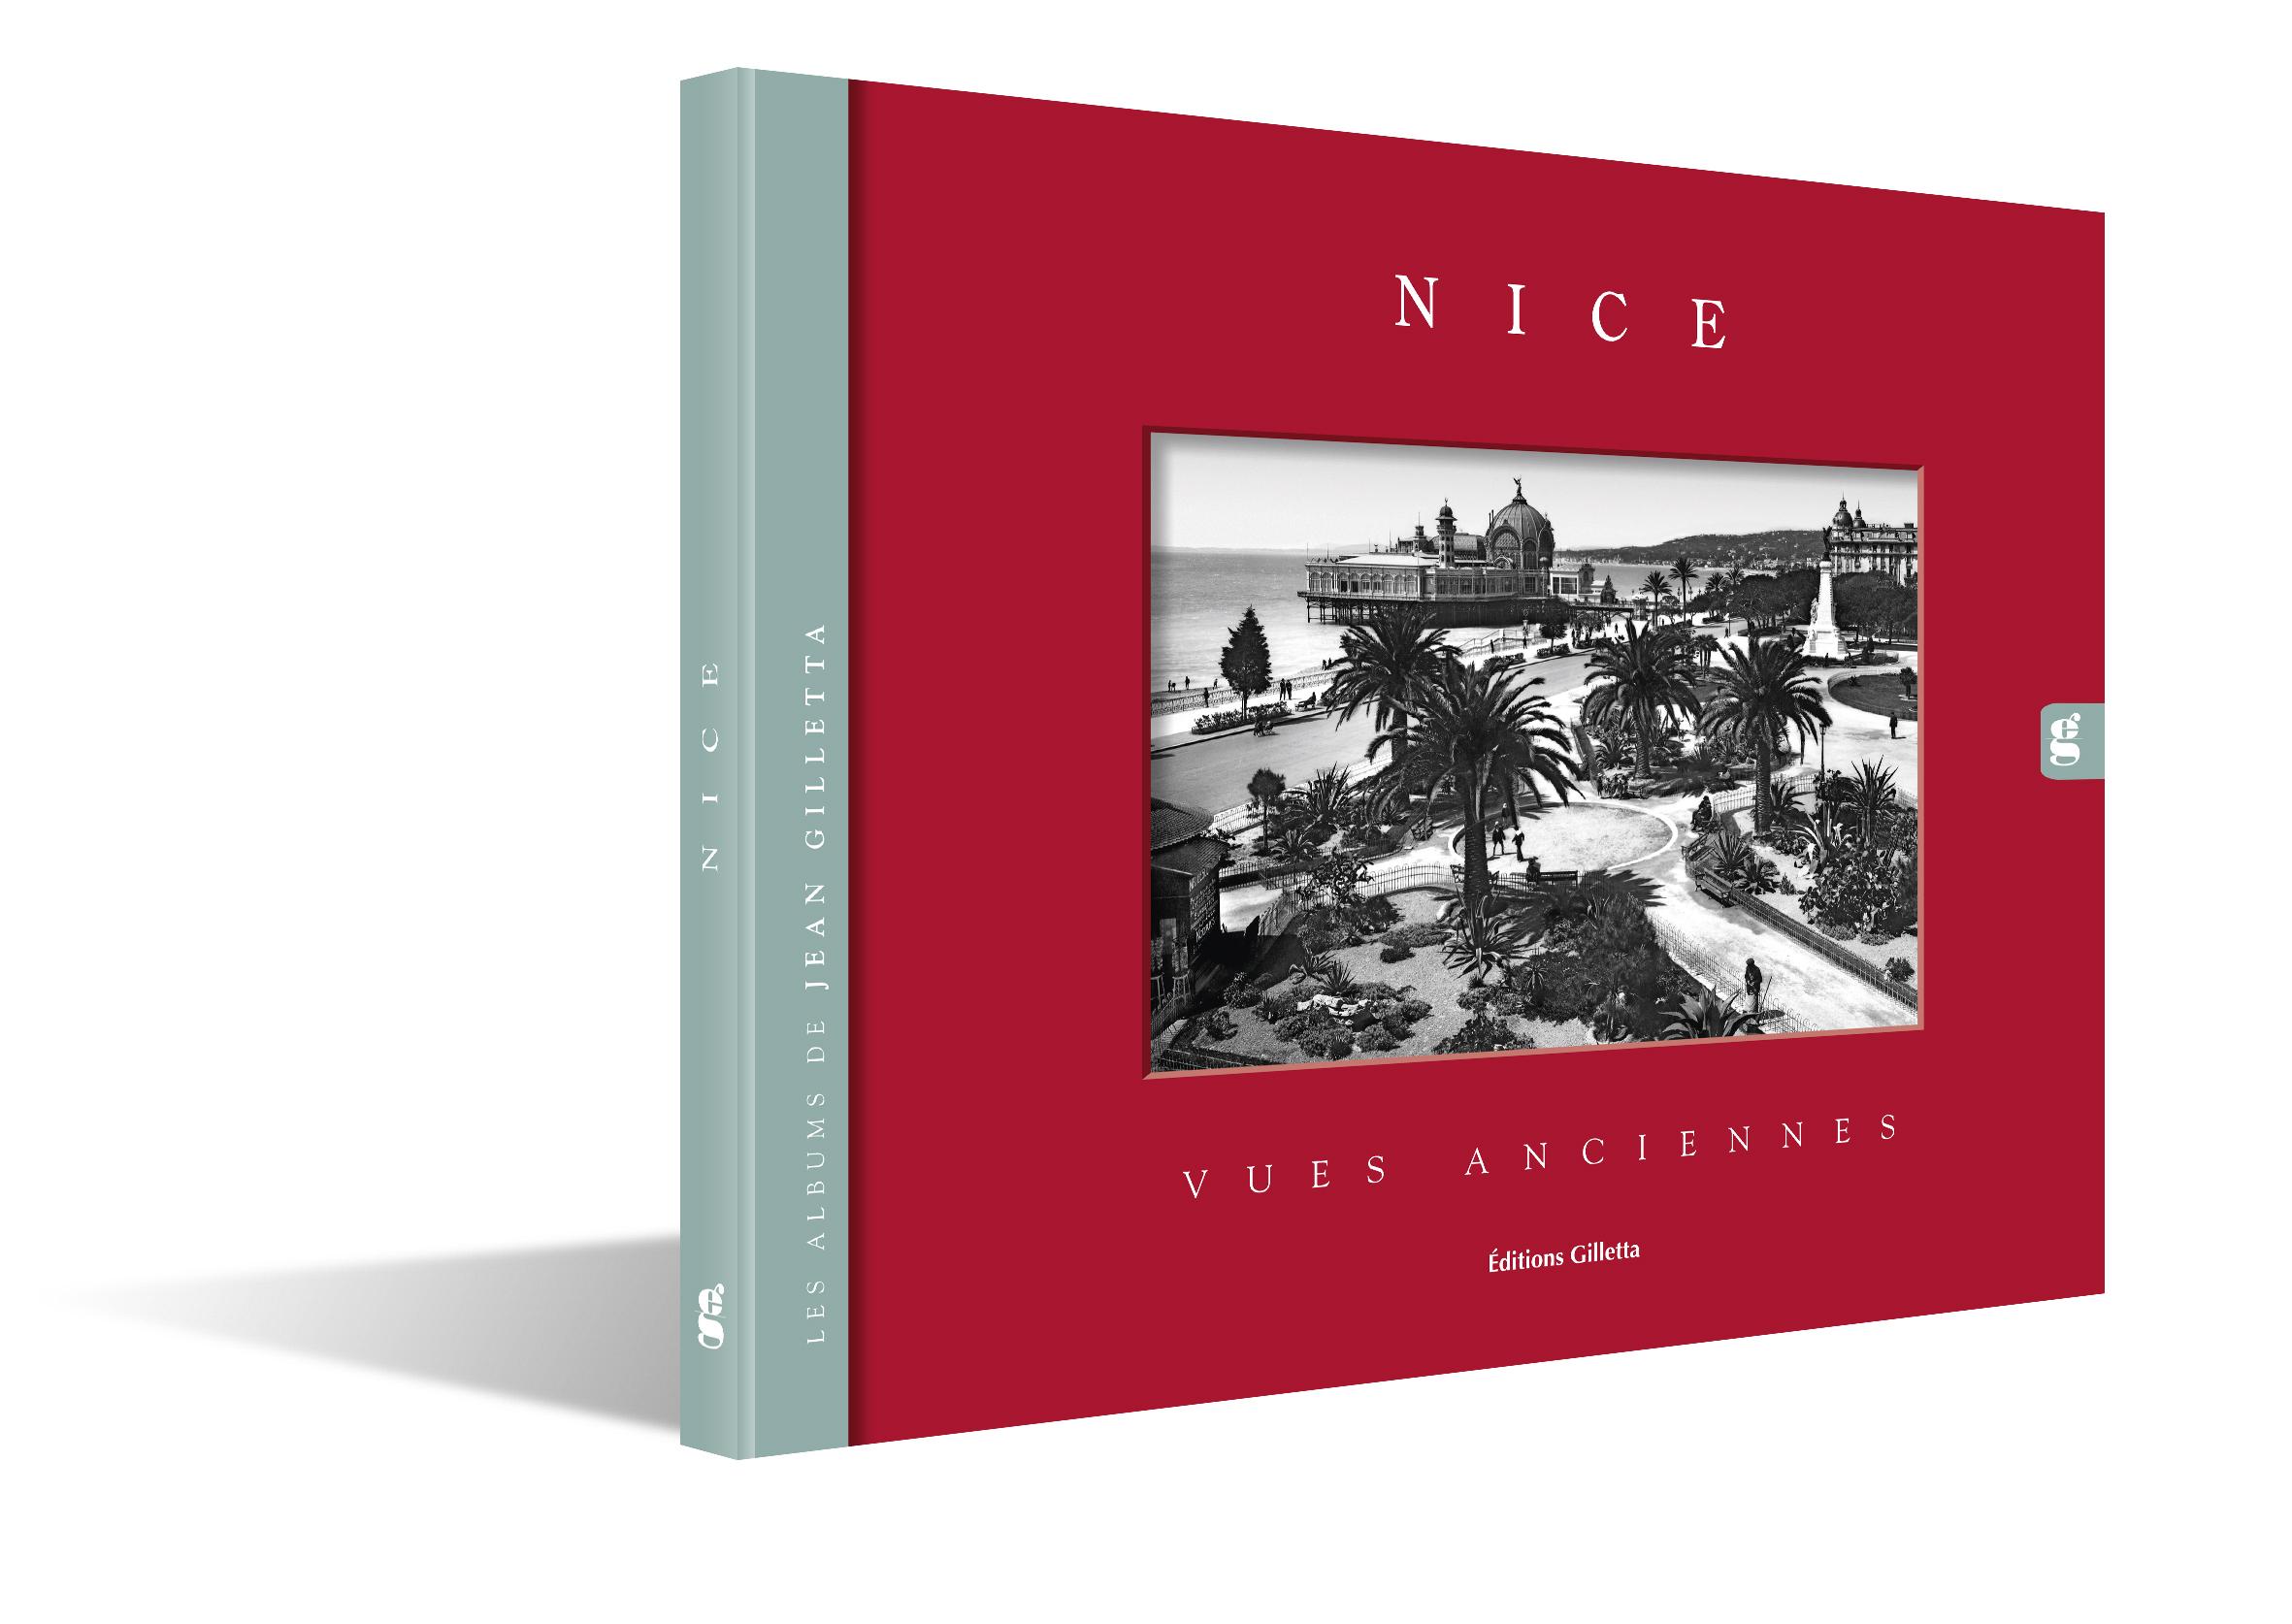 NICE, VUES ANCIENNES (FR / ANG)